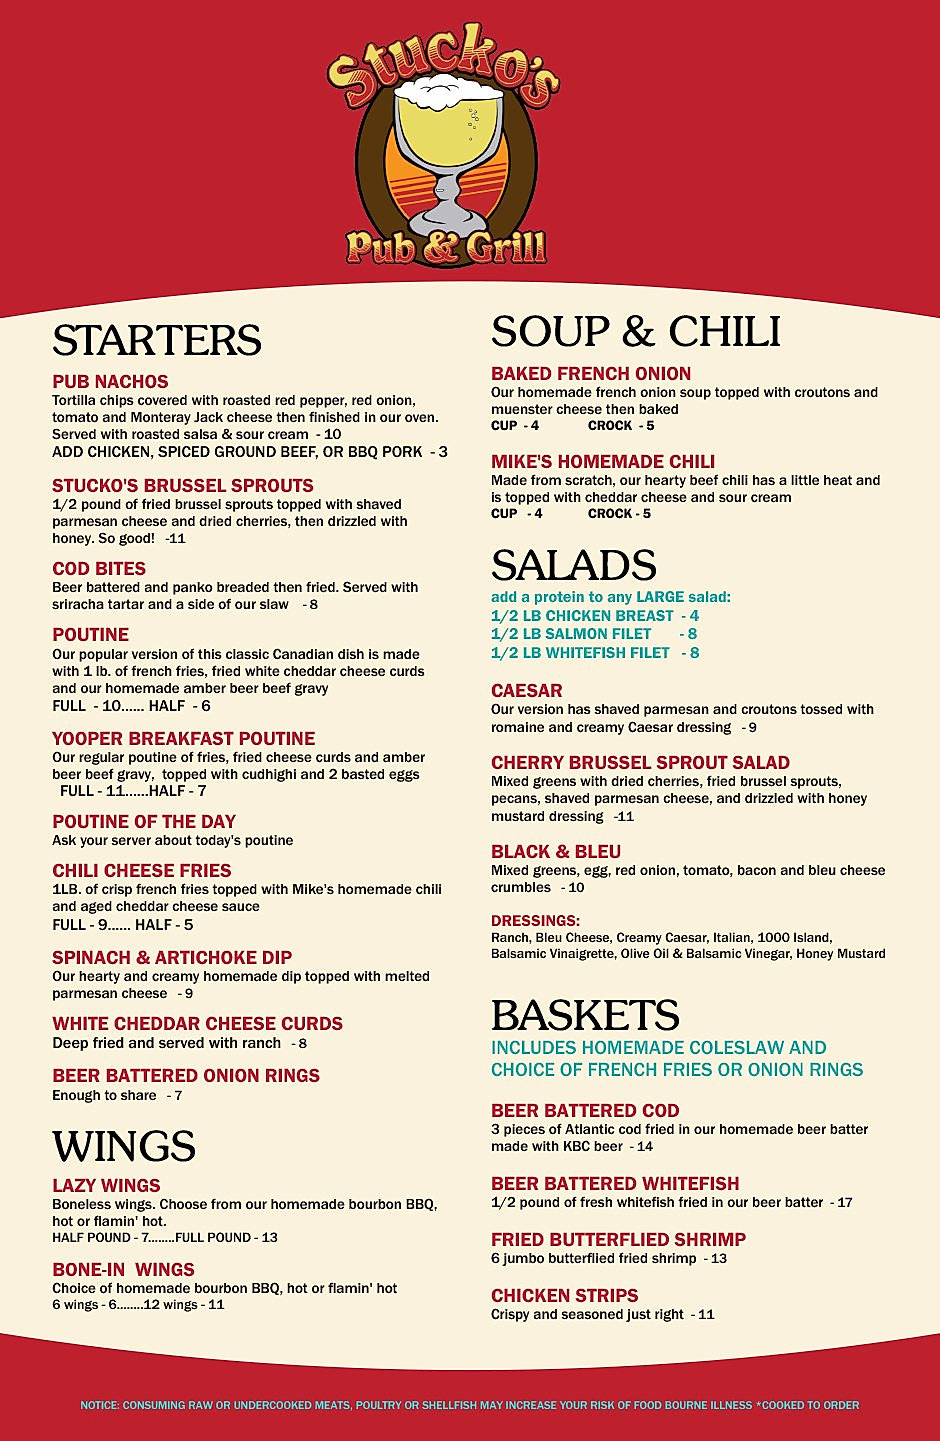 Stuckos restaurant menu wine list hours location deals Marquette Now